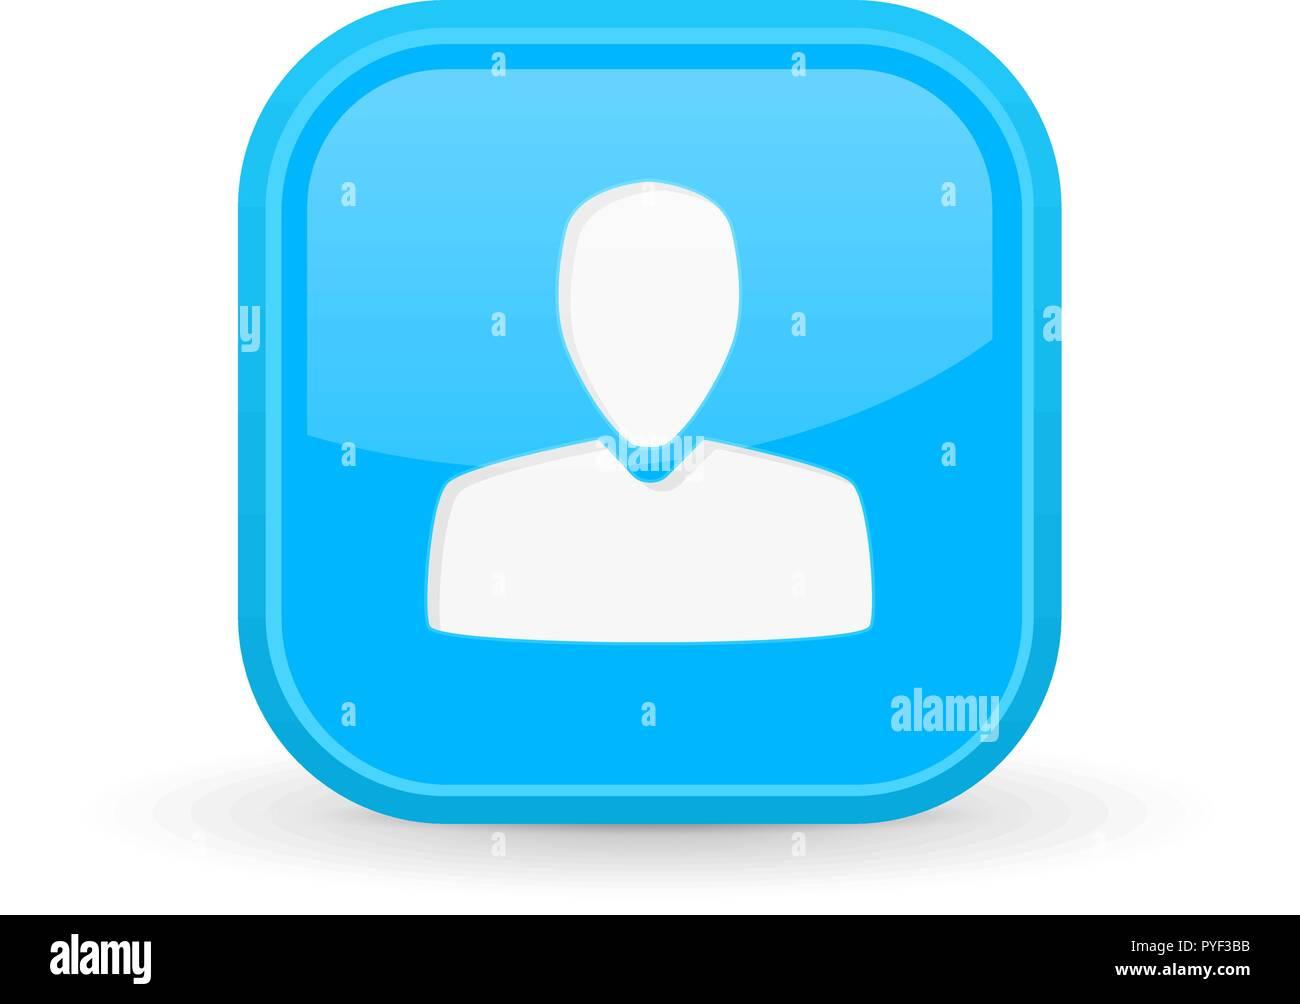 User icon. Blue square shiny button - Stock Image